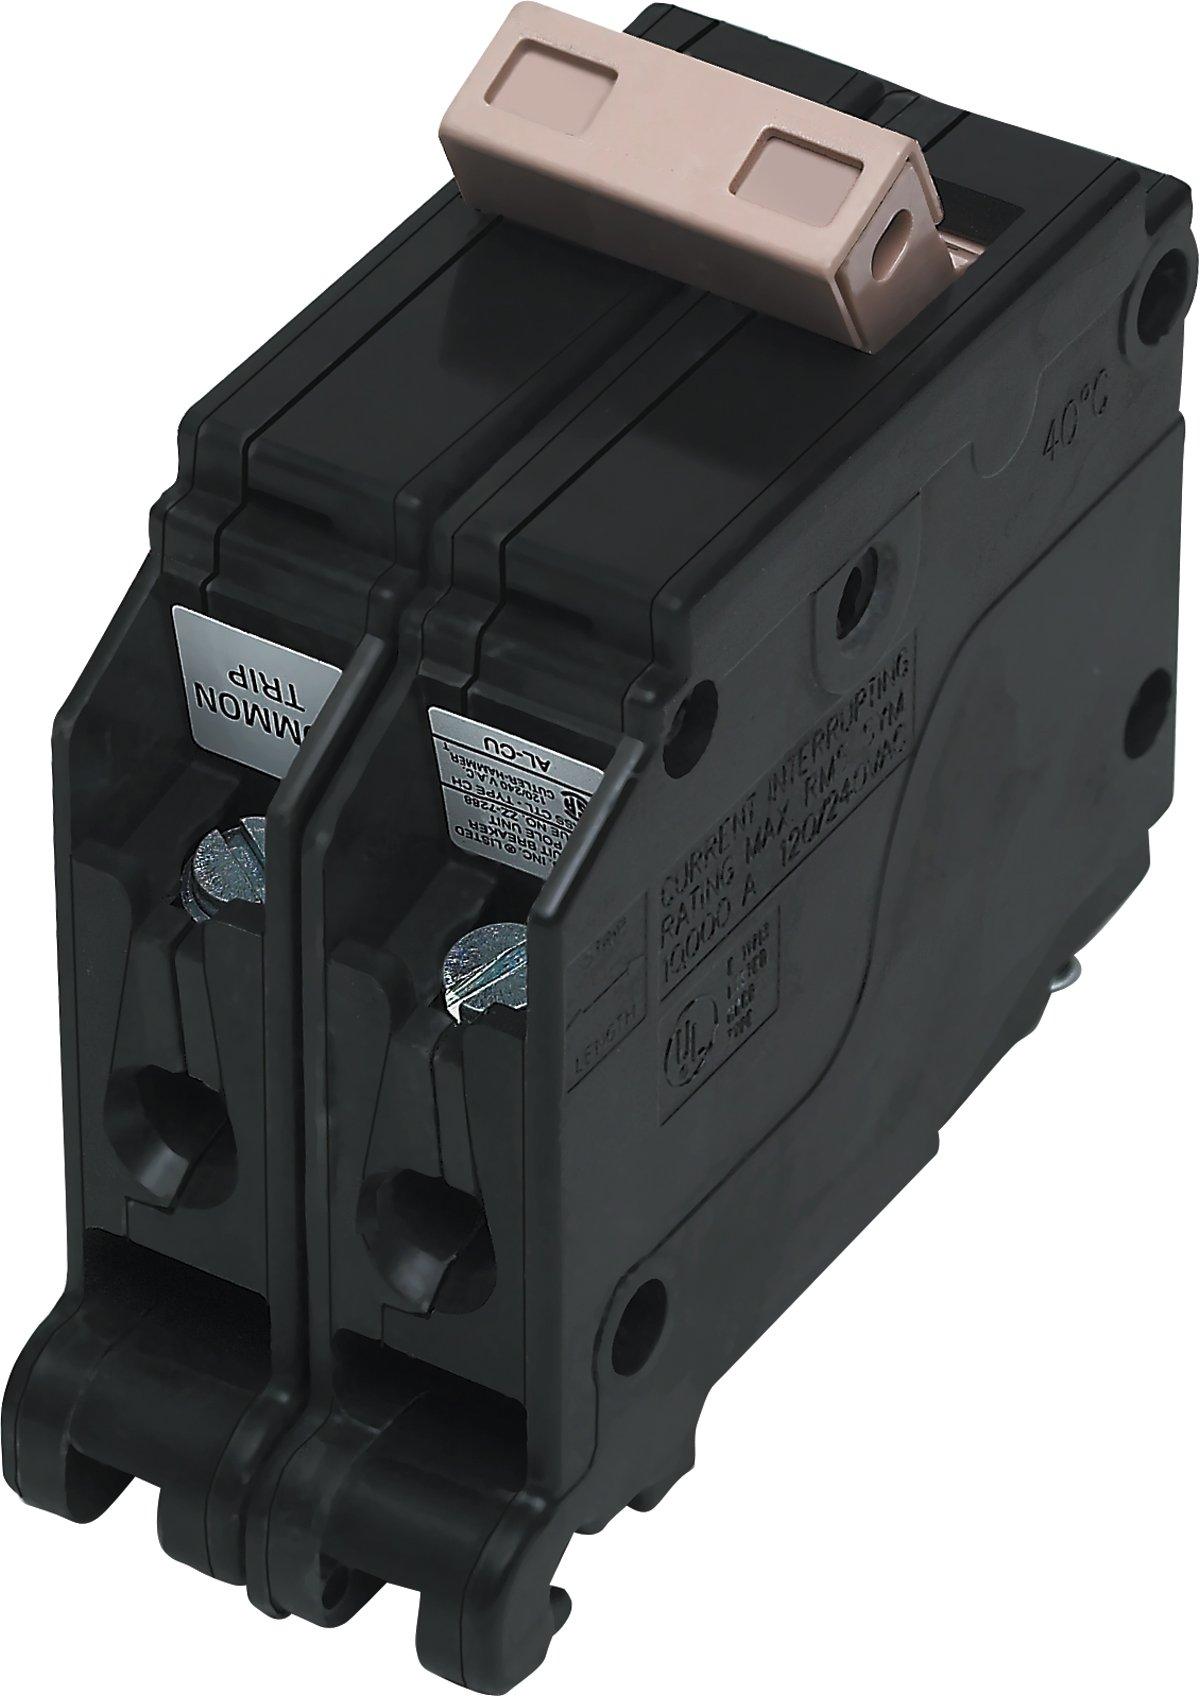 Cutler Hammer CH290 Circuit Breaker, 2-Pole 90-Amp